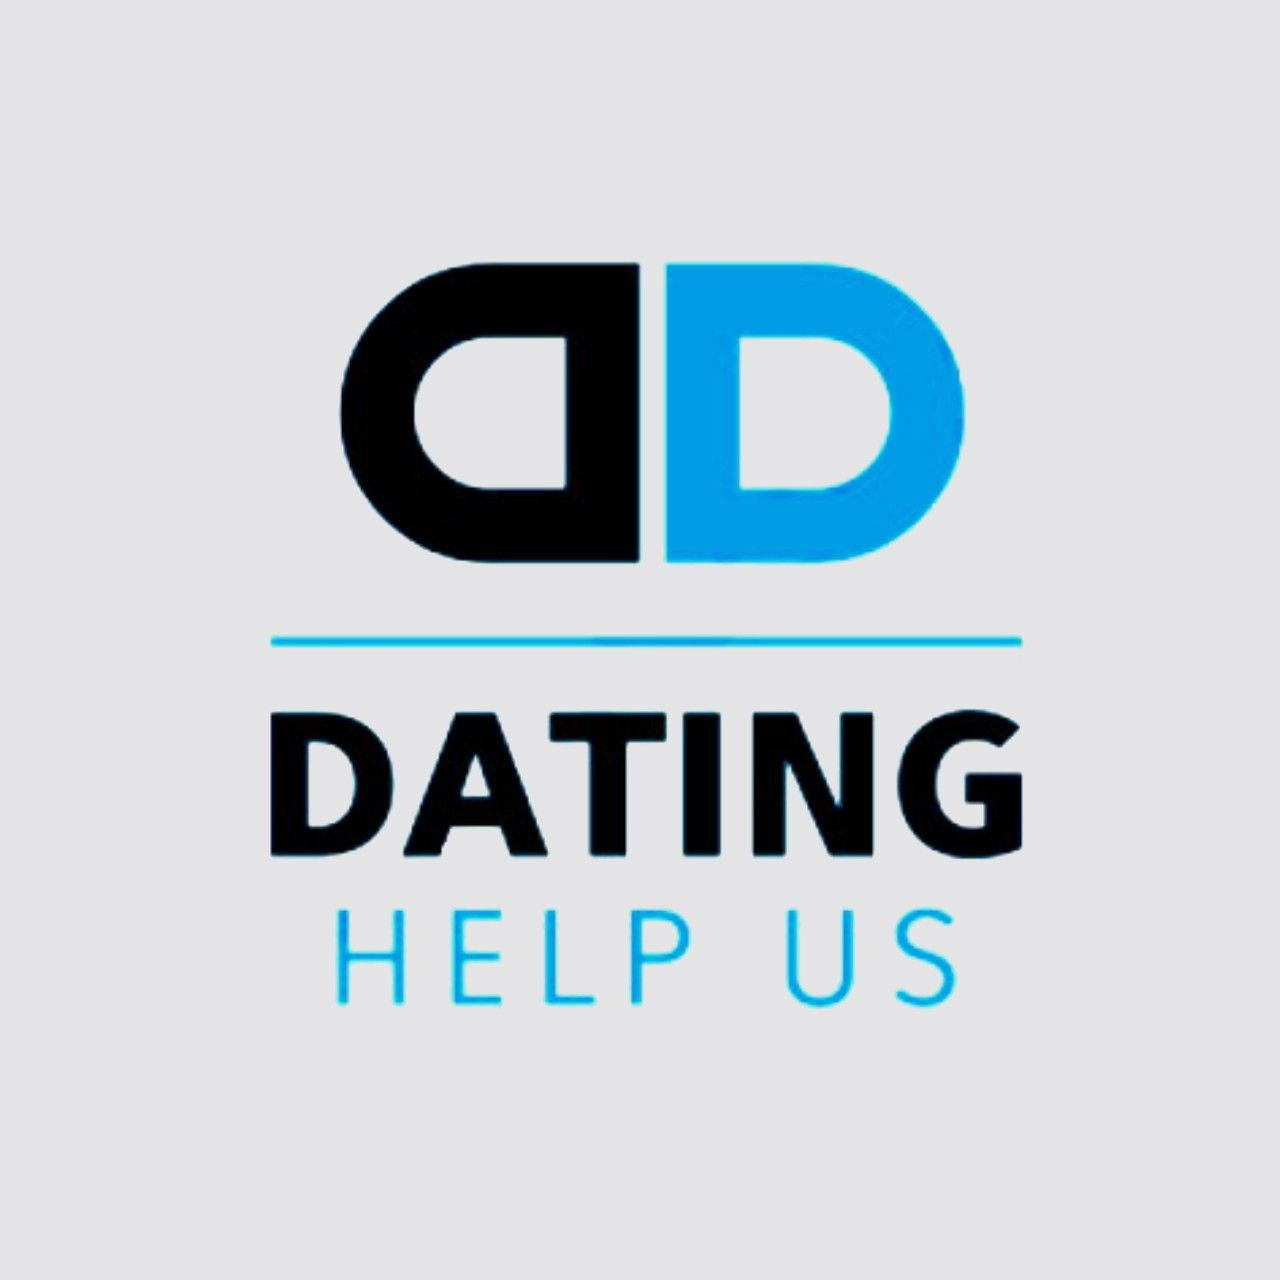 Tinder Login/Help 1(833)6719719 Tinder Customer Service